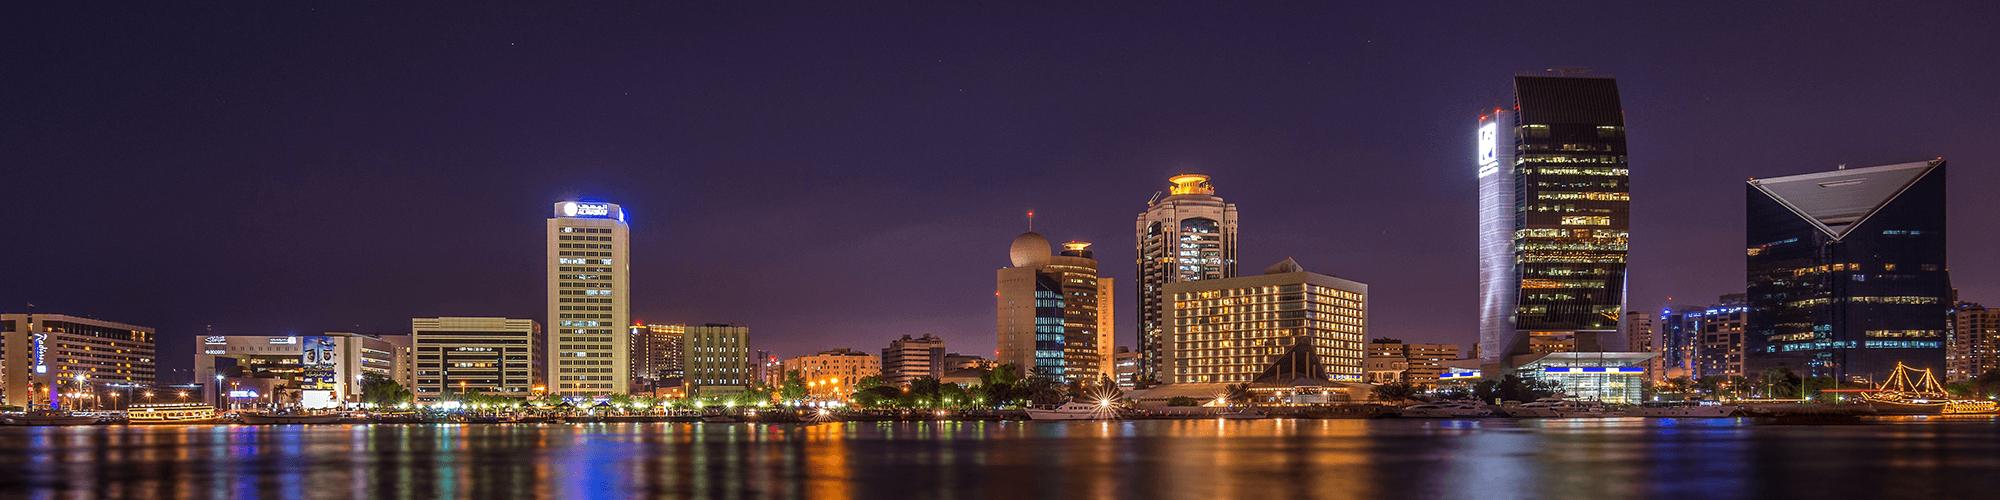 visit dubai - Visit UAE